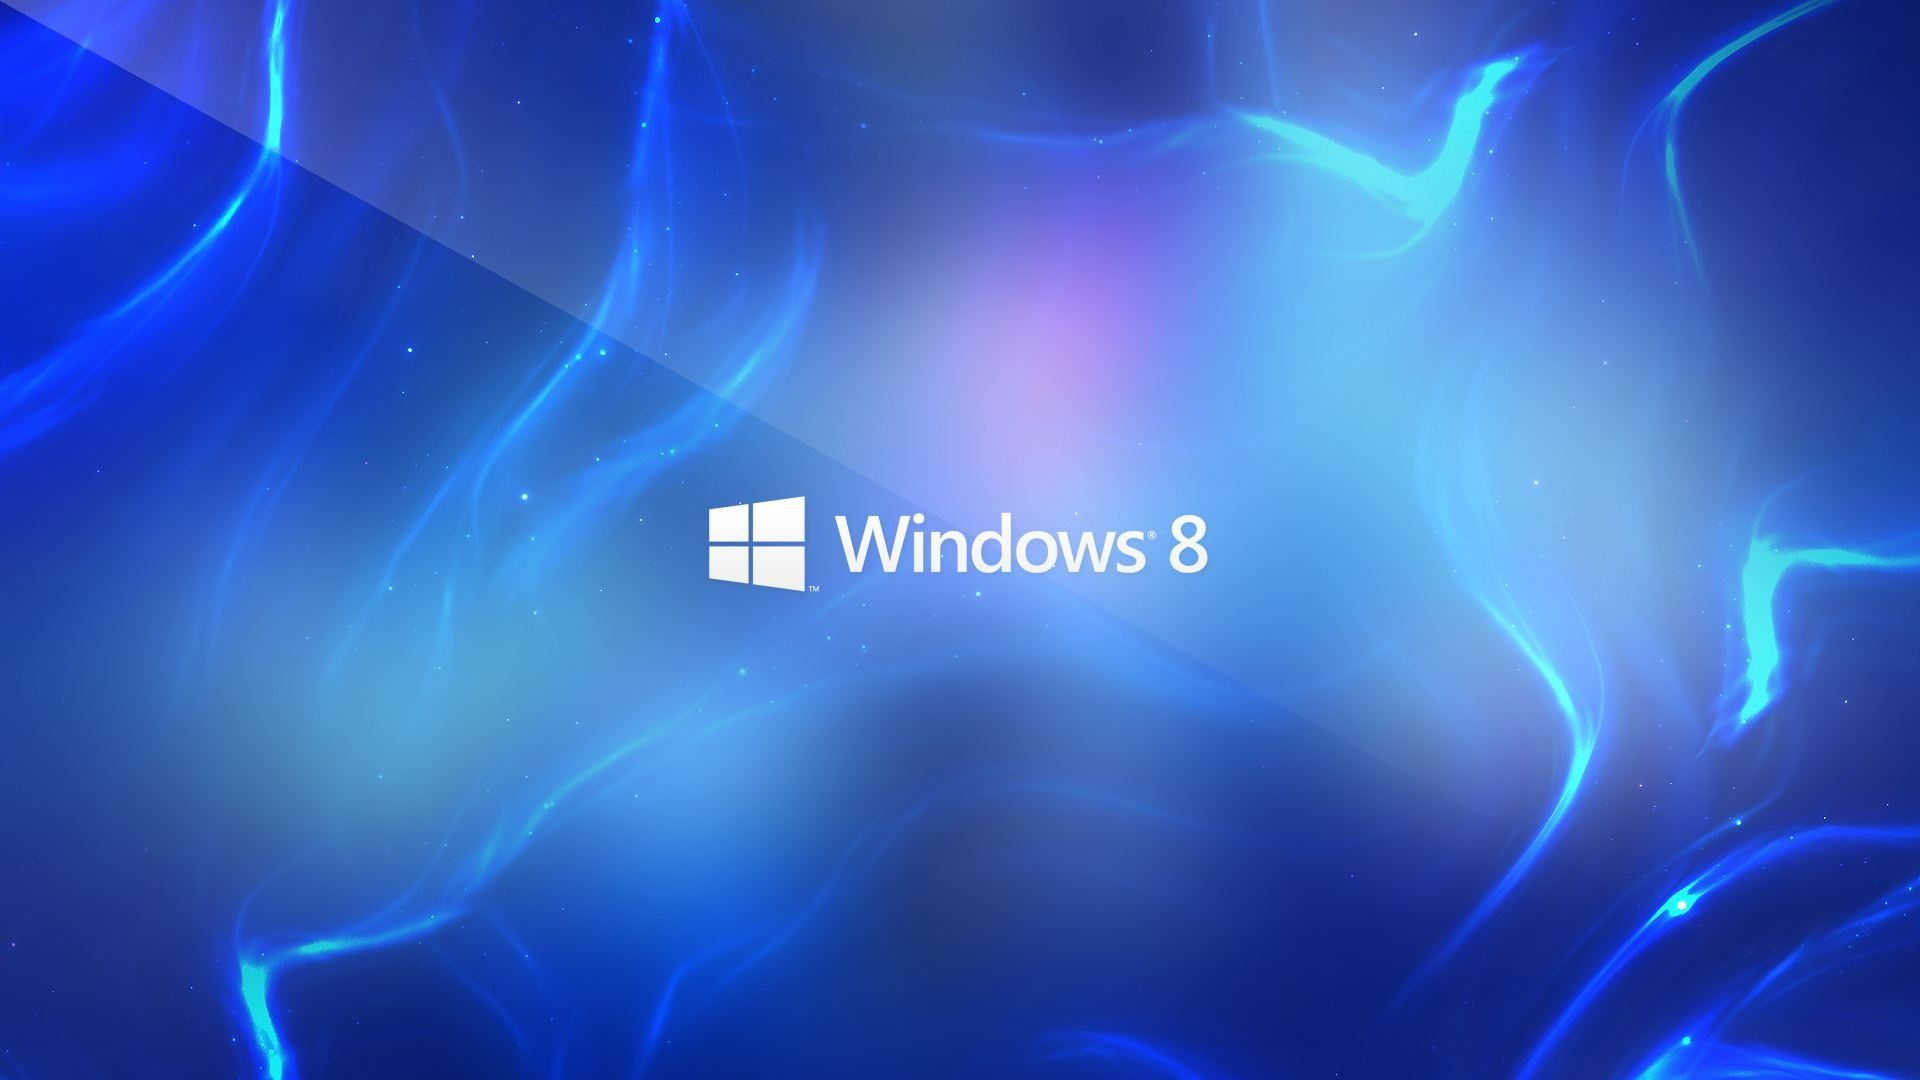 windows 8 blue hd wallpapers | windows 8 wallpapers | pinterest